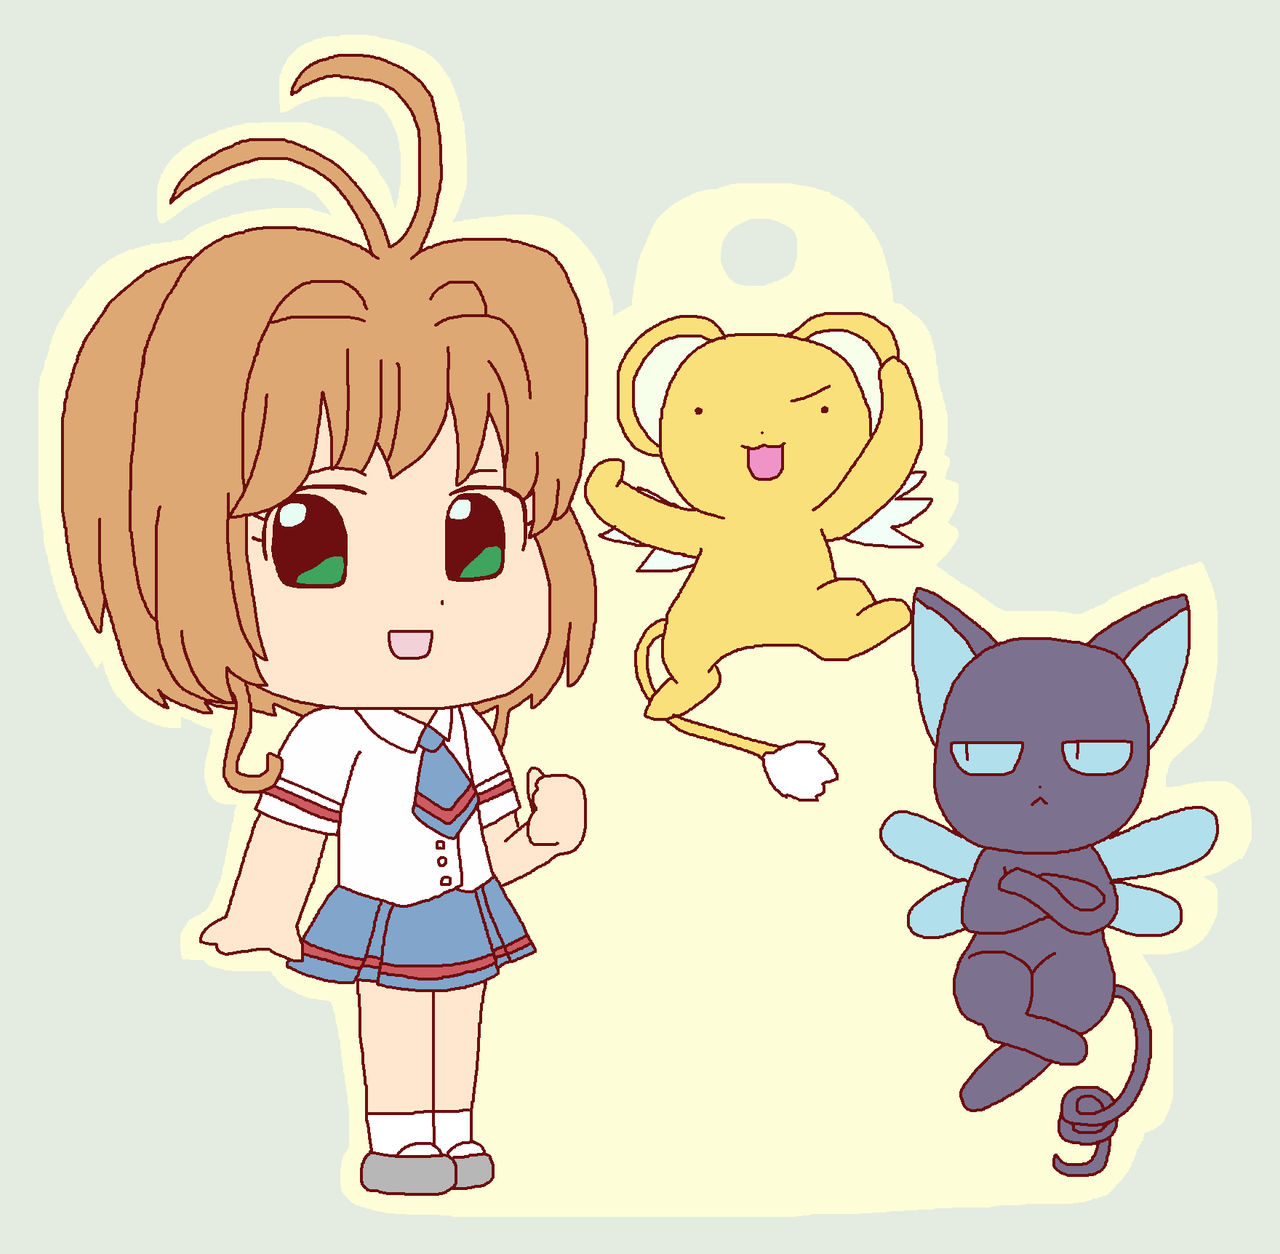 Kero-chan and Suppi-chan